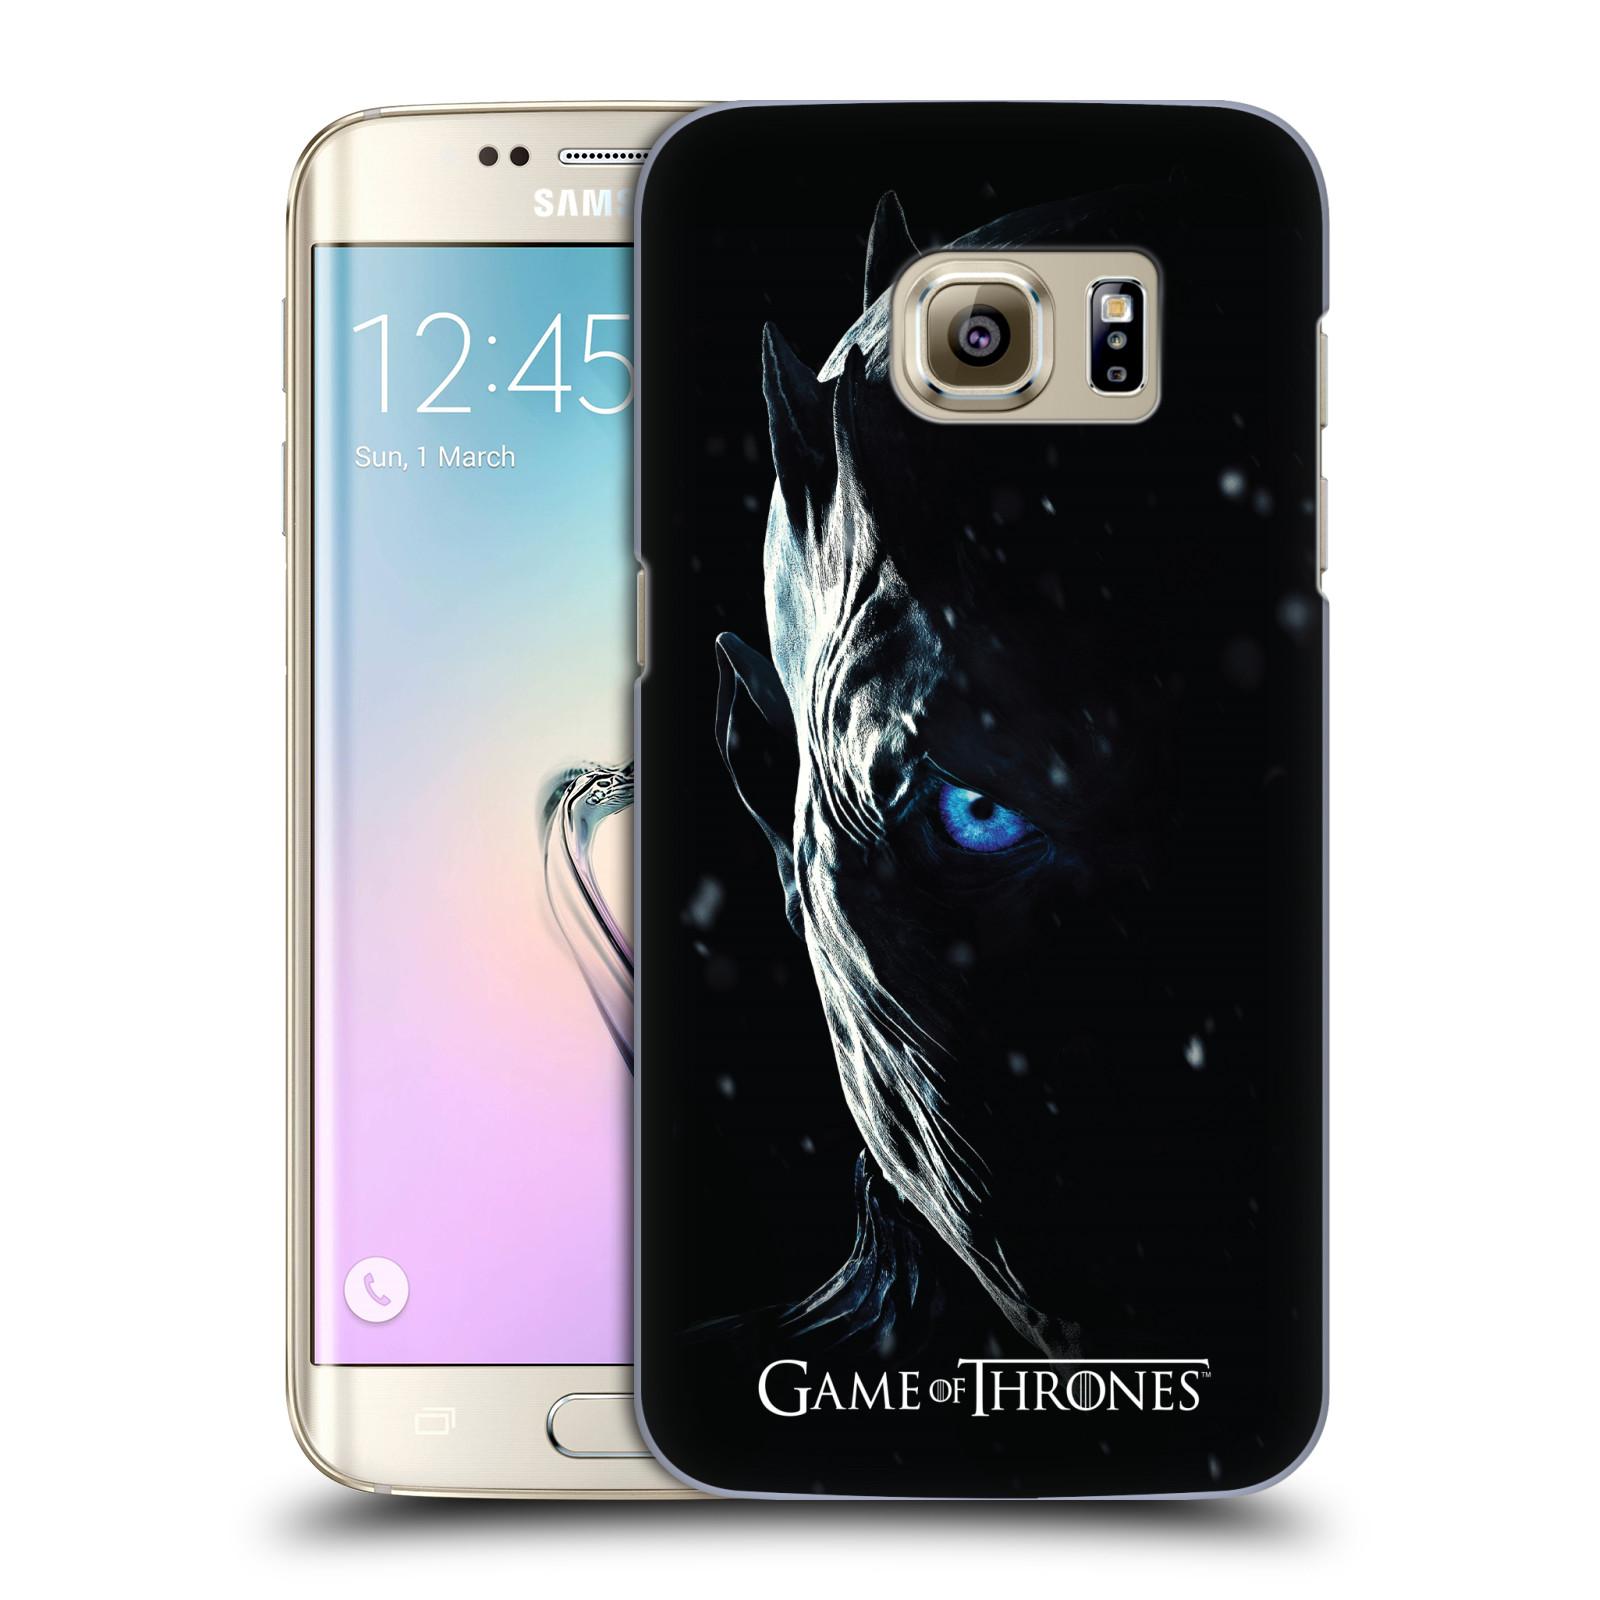 Plastové pouzdro na mobil Samsung Galaxy S7 Edge - Head Case - Hra o trůny - Night King (Plastový kryt či obal na mobilní telefon s motivem Game of Thrones - Night King - Season 7 pro Samsung Galaxy S7 Edge SM-G935F)